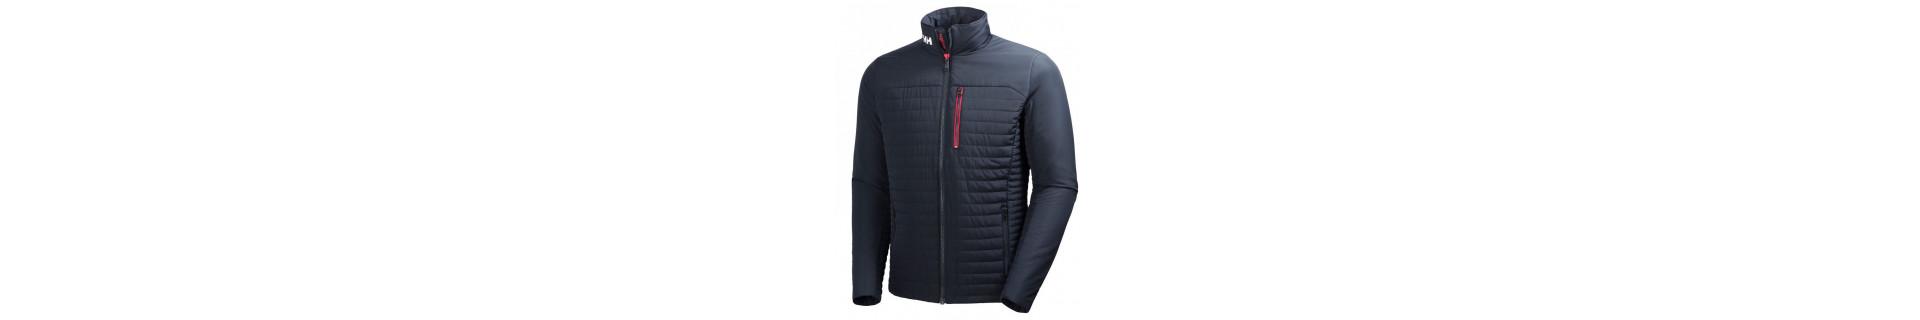 Jaquetas masculinas Adidas, Carhartt, Helly Hansen, Ellese, Jott, Nike